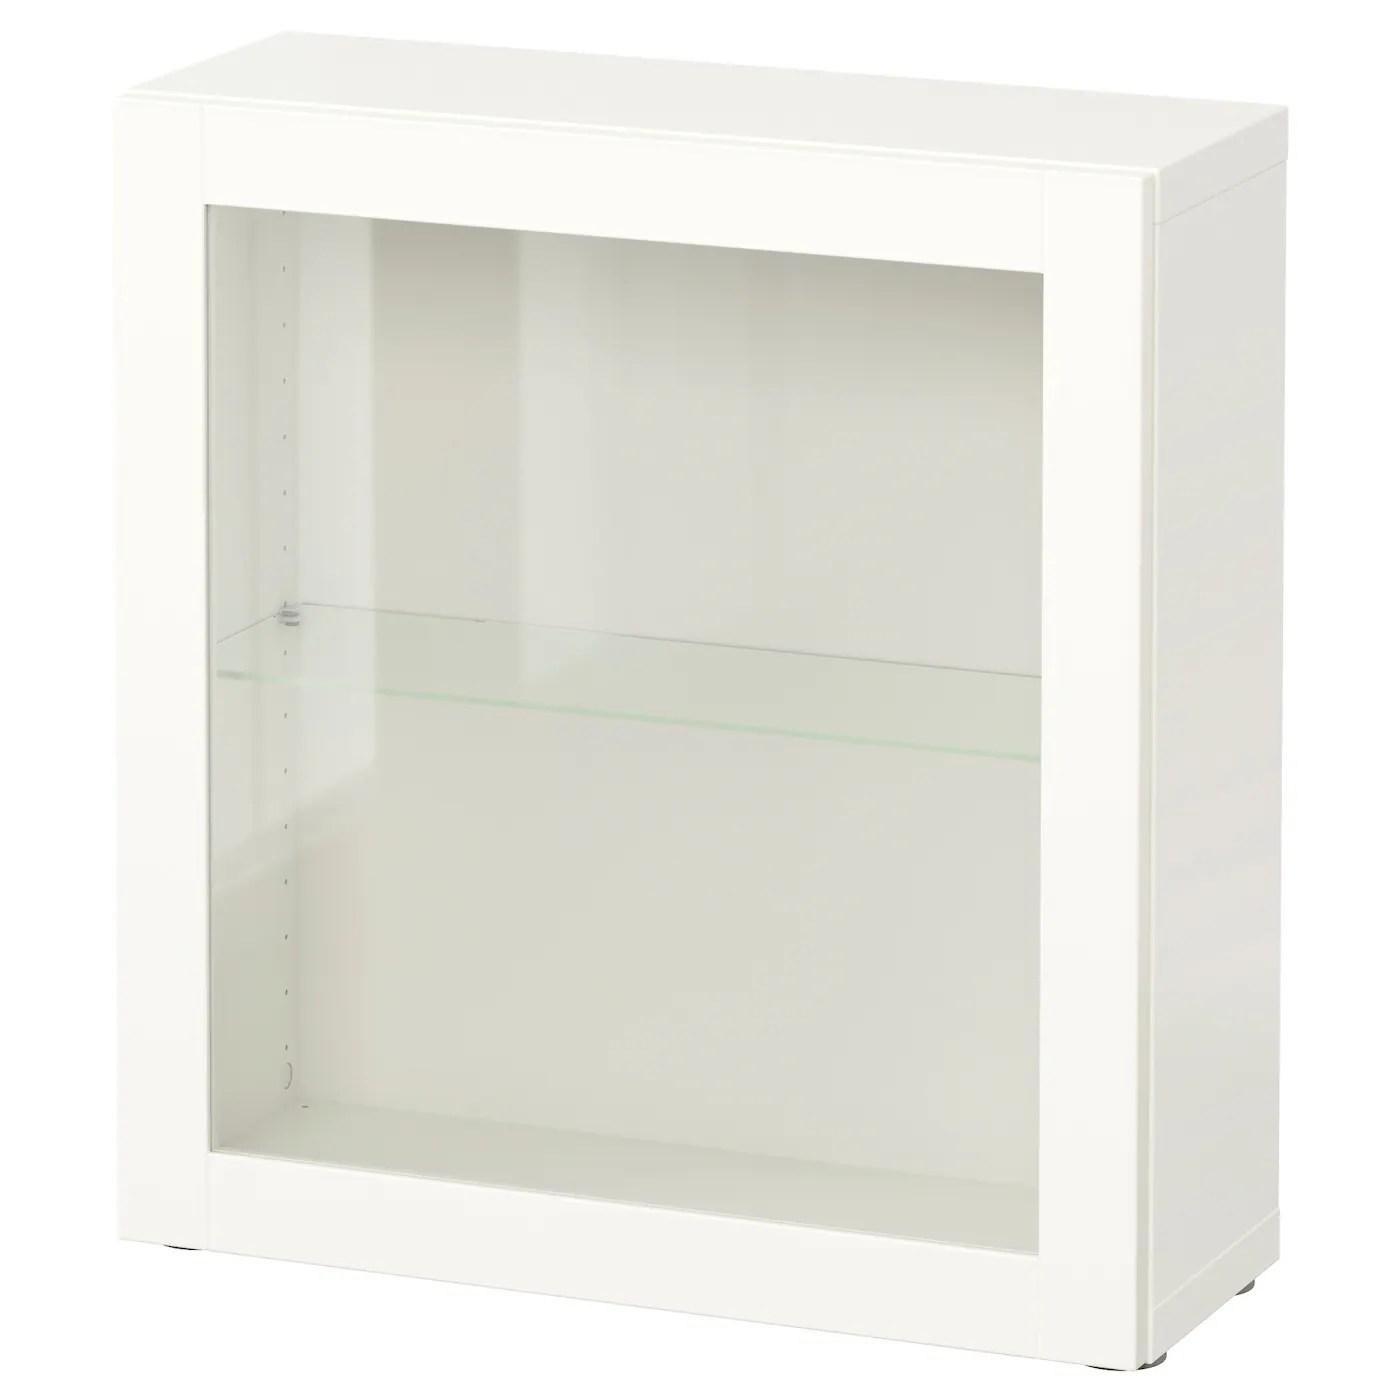 besta etagere avec porte vitree blanc sindvik verre transparent blanc 23 5 8x8 5 8x25 1 4 60x22x64 cm